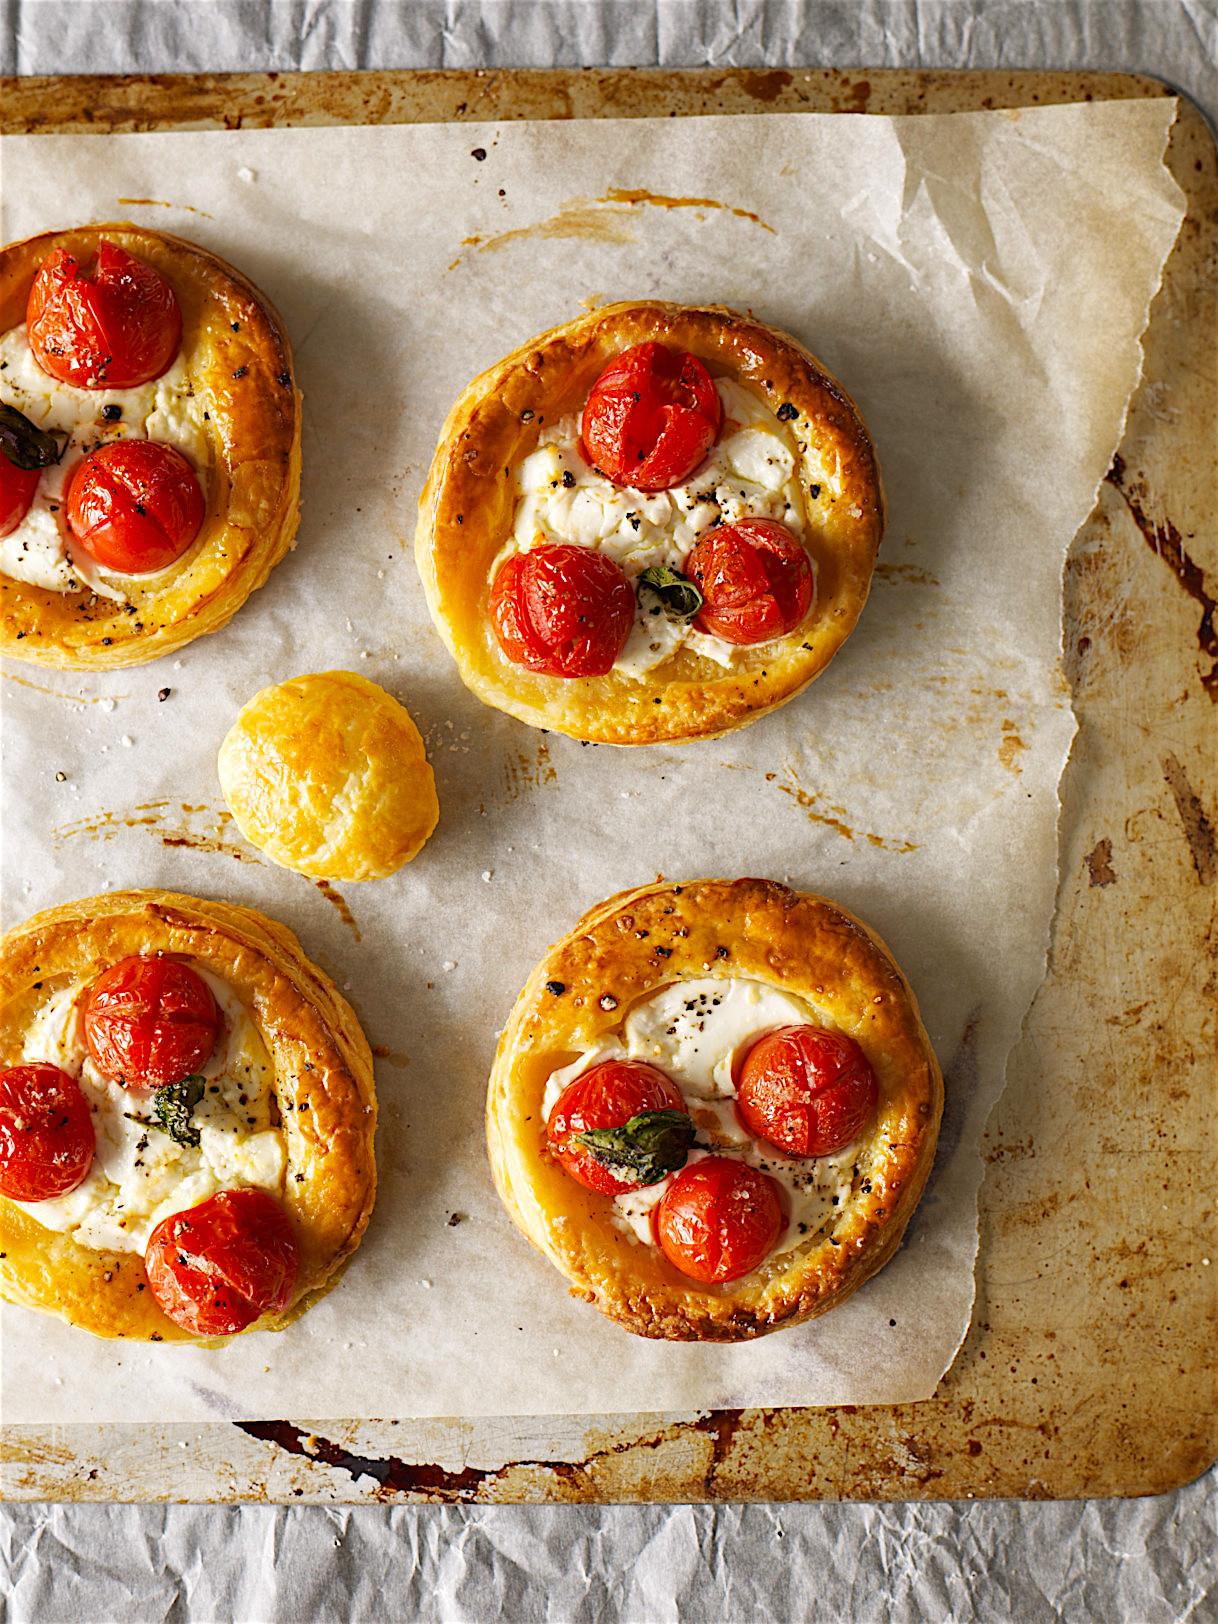 Tomato & Goat's Cheese Tarts